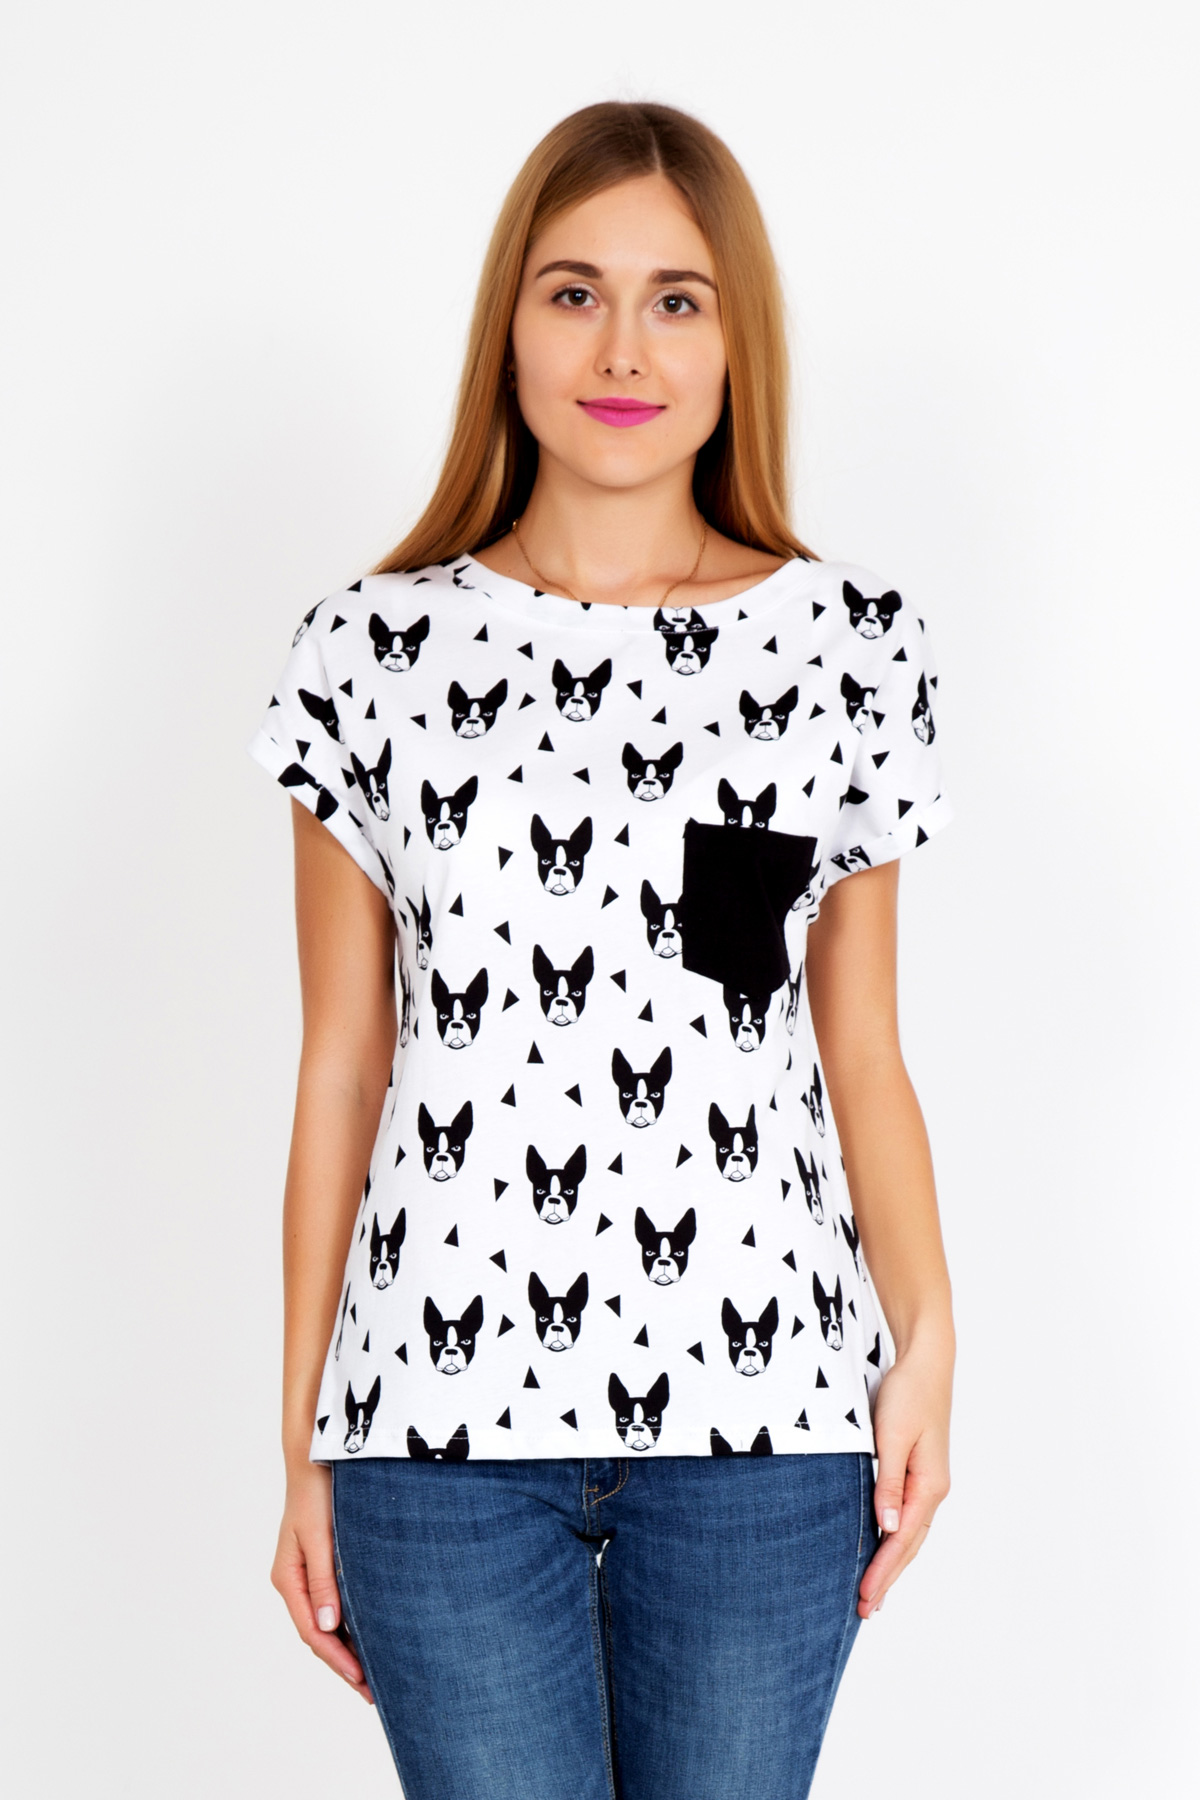 Жен. футболка Dog р. 52Майки и футболки<br>Факт. ОГ: 108 см <br>Факт. ОТ: 108 см <br>Факт. ОБ: 110 см <br>Длина по спинке: 64 см<br><br>Тип: Жен. футболка<br>Размер: 52<br>Материал: Кулирка